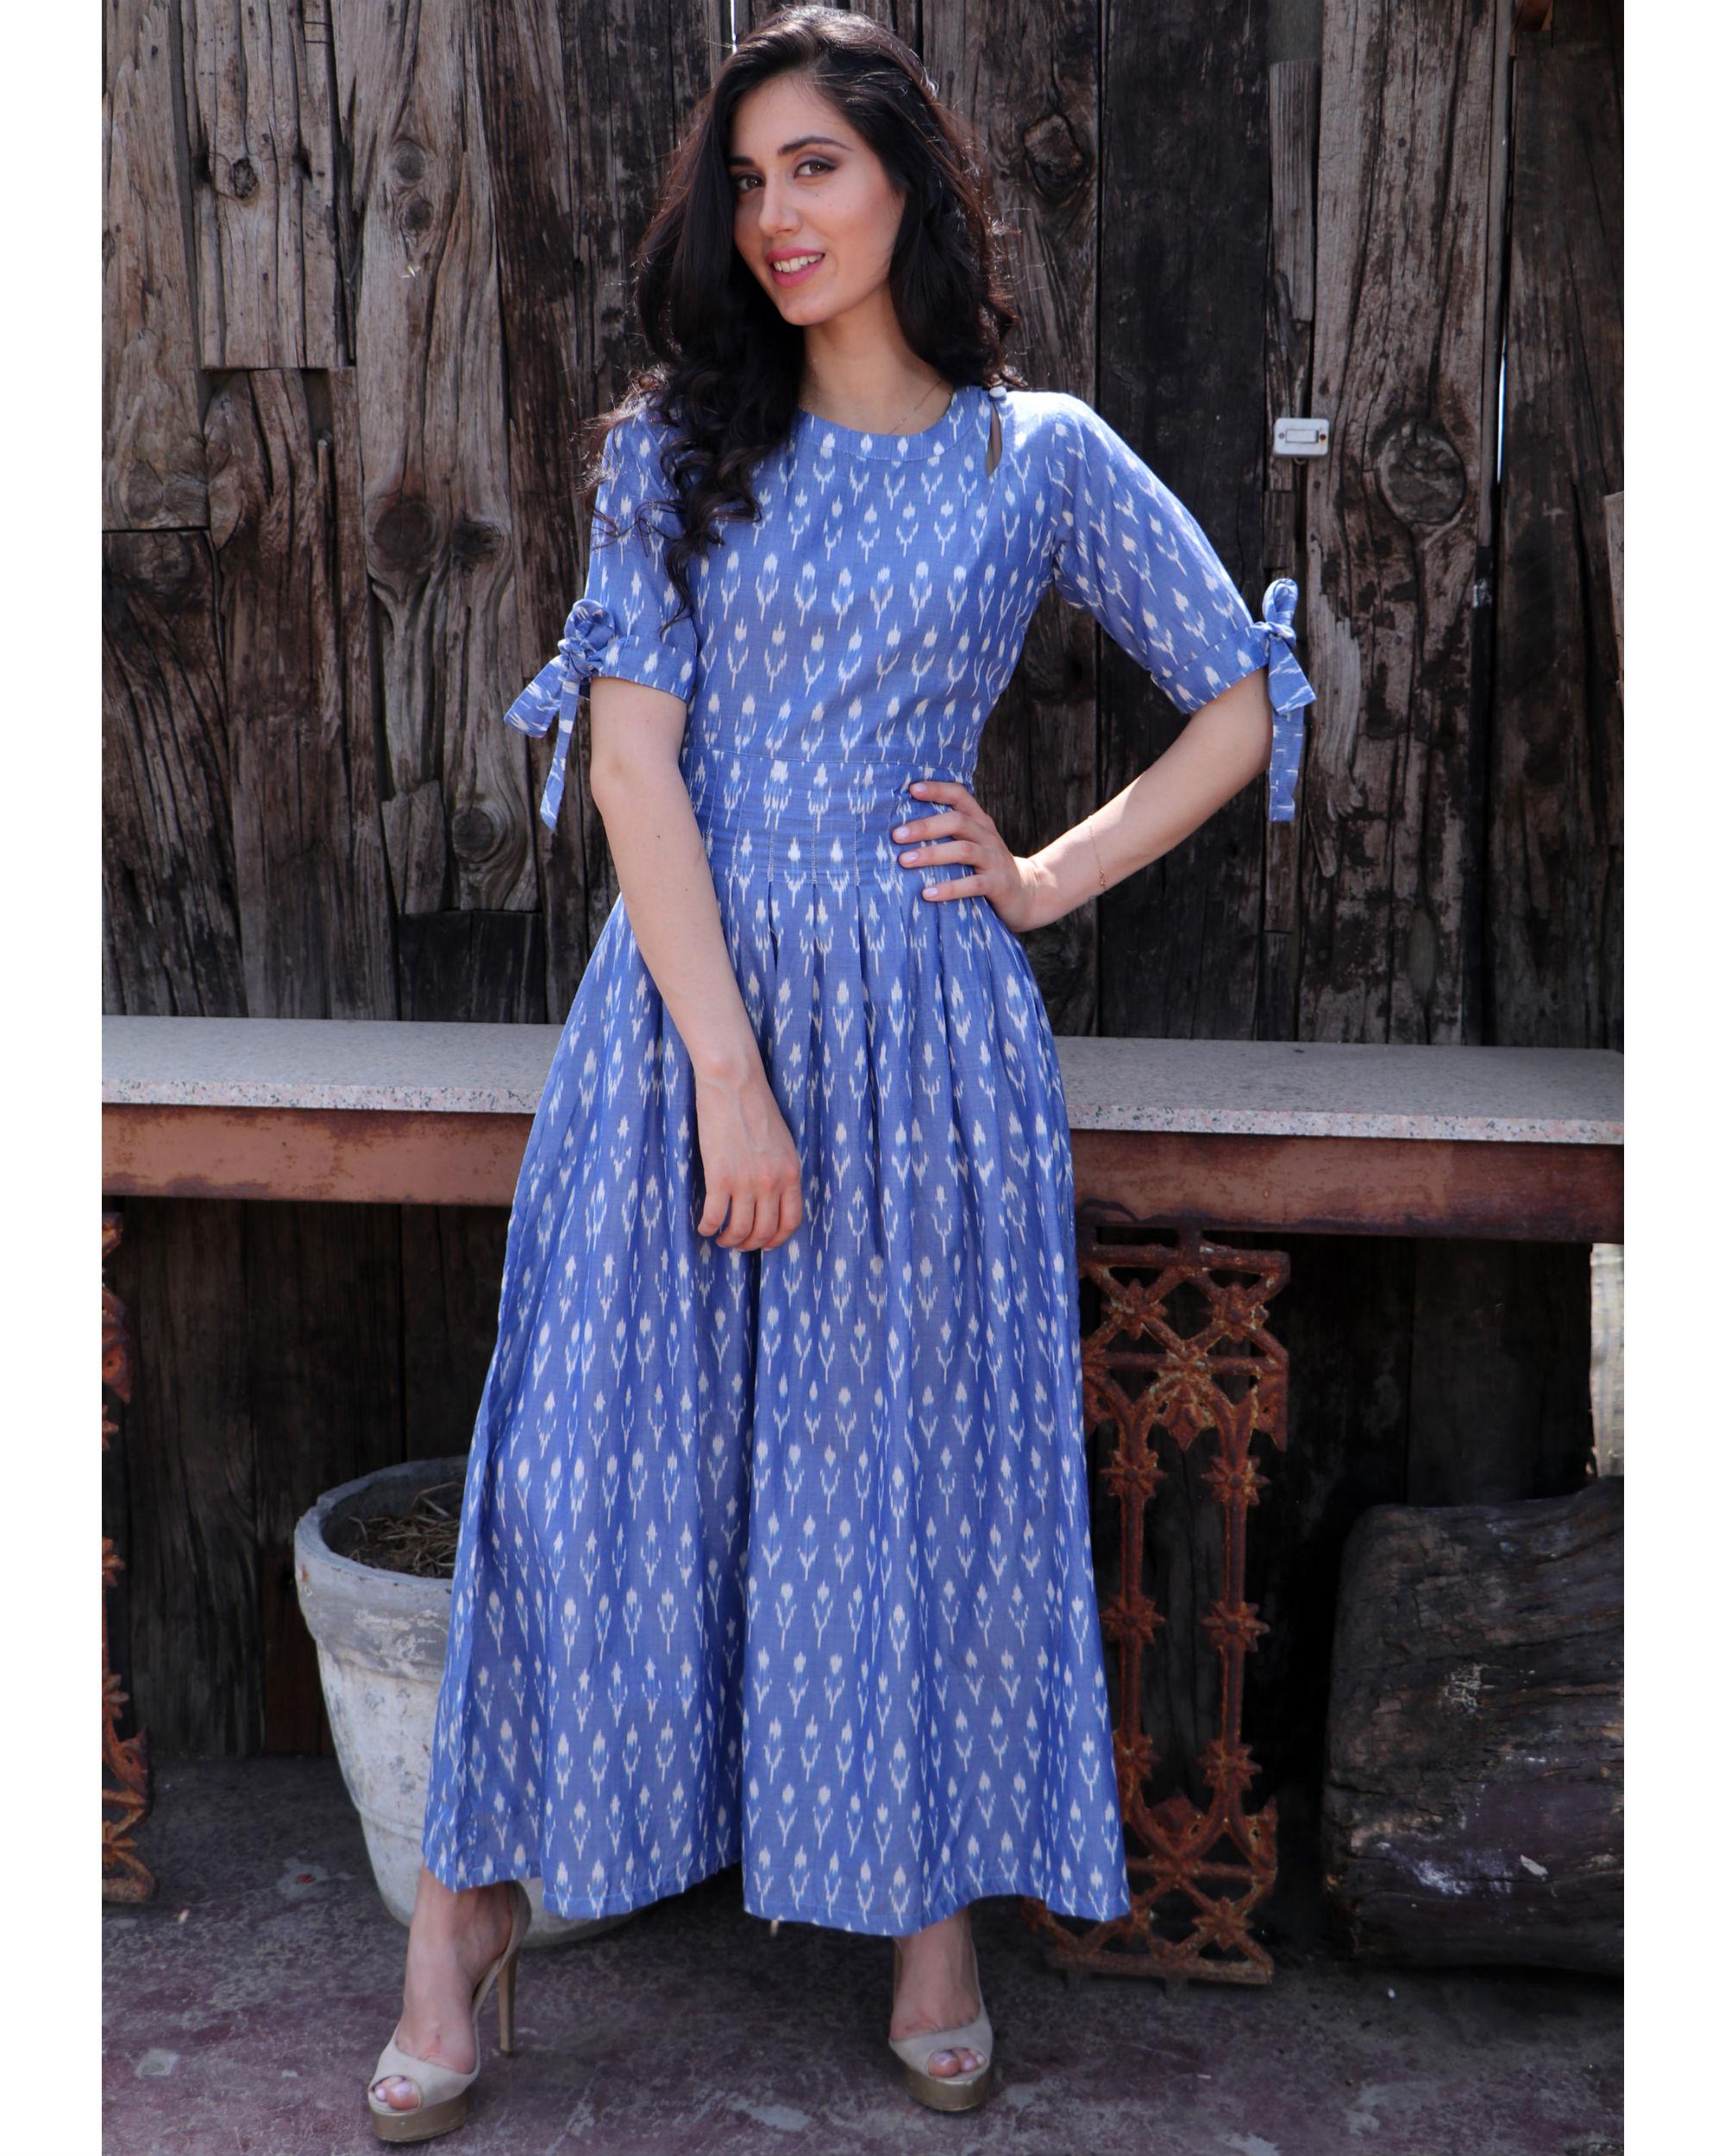 Steel blue knot sleeve dress